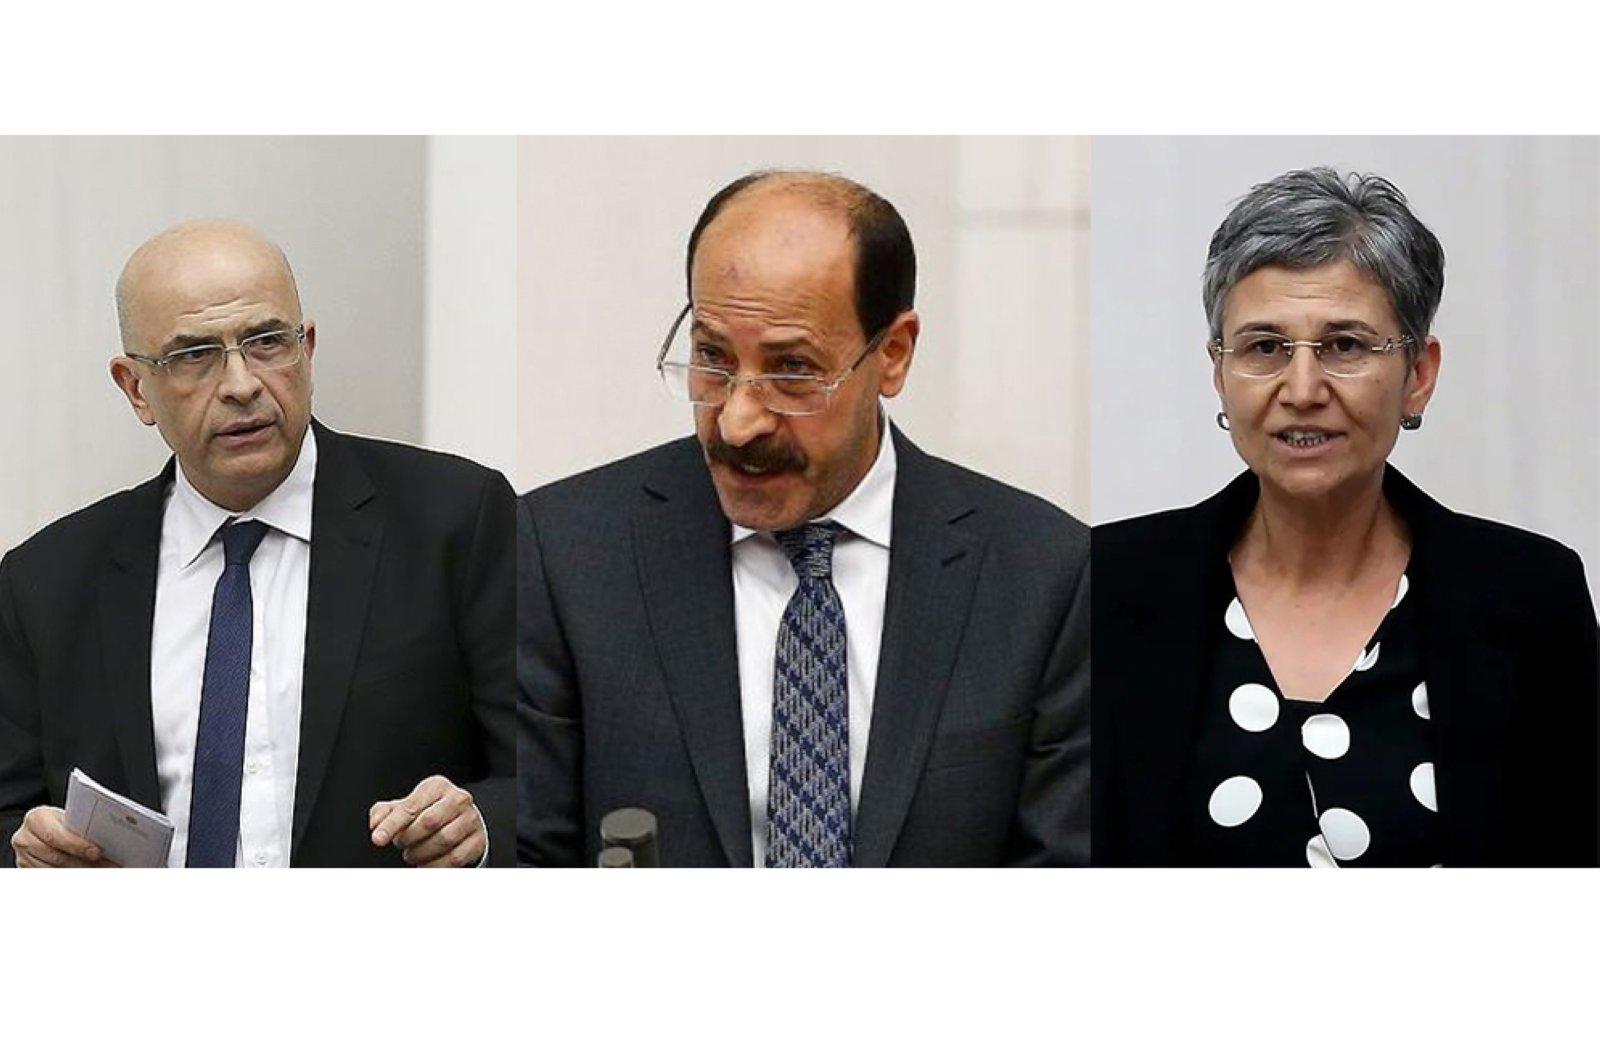 Former People's Republican Party (CHP) deputy Enis Berberoğlu (L), former Peoples' Democratic Party (HDP) deputy Musa Farisoğulları (C) and former HDP deputy Leyla Güven (R) are seen in undated file photos.